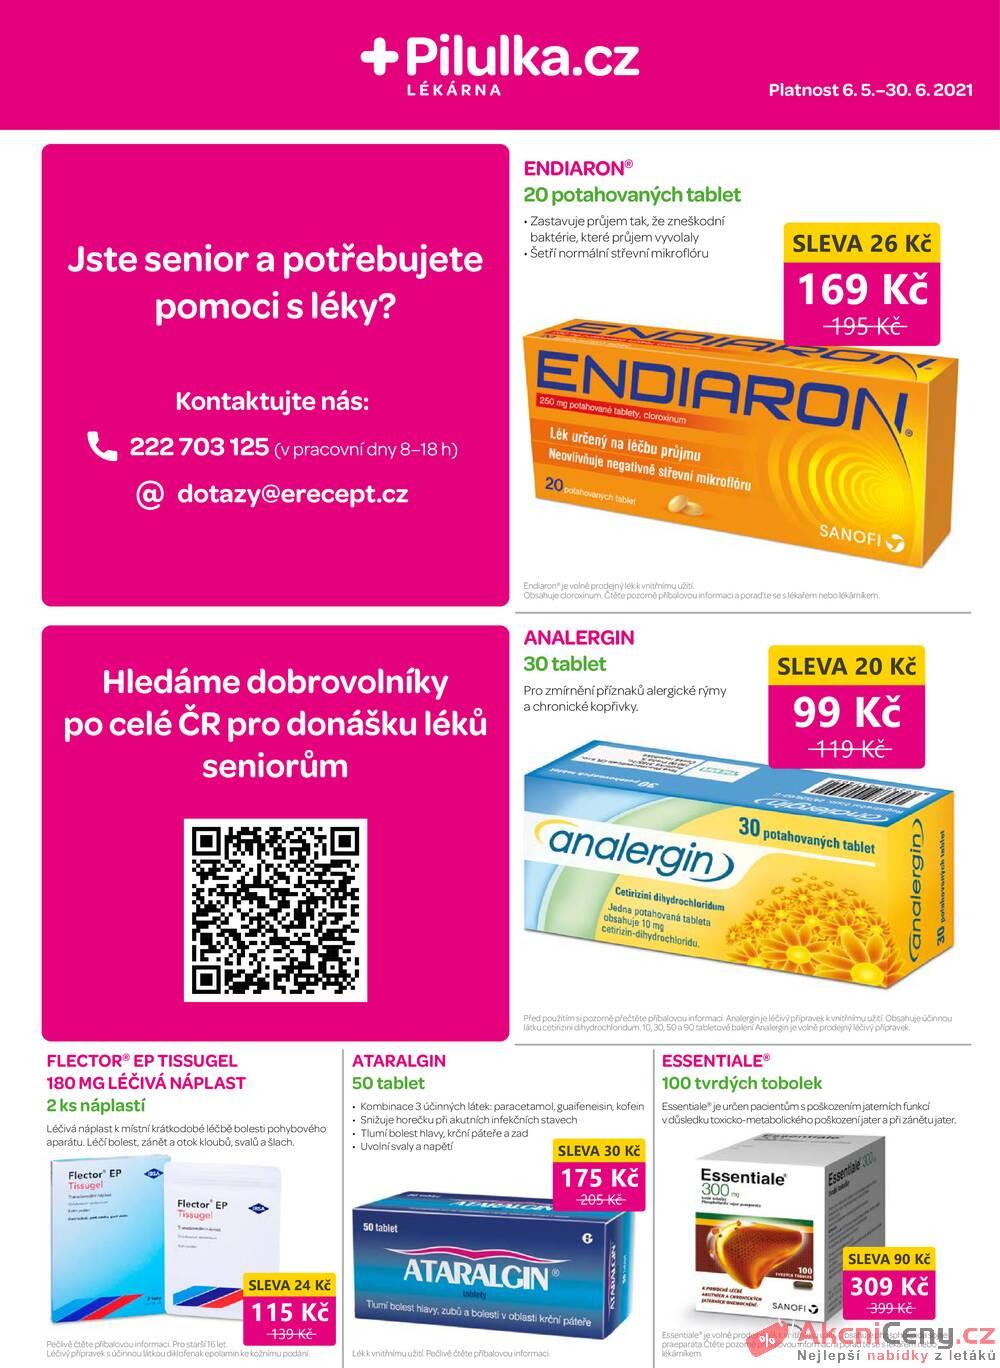 Leták Pilulka lékárna - Pilulka lékárna od 6.5. do 30.6.2021 - strana 1